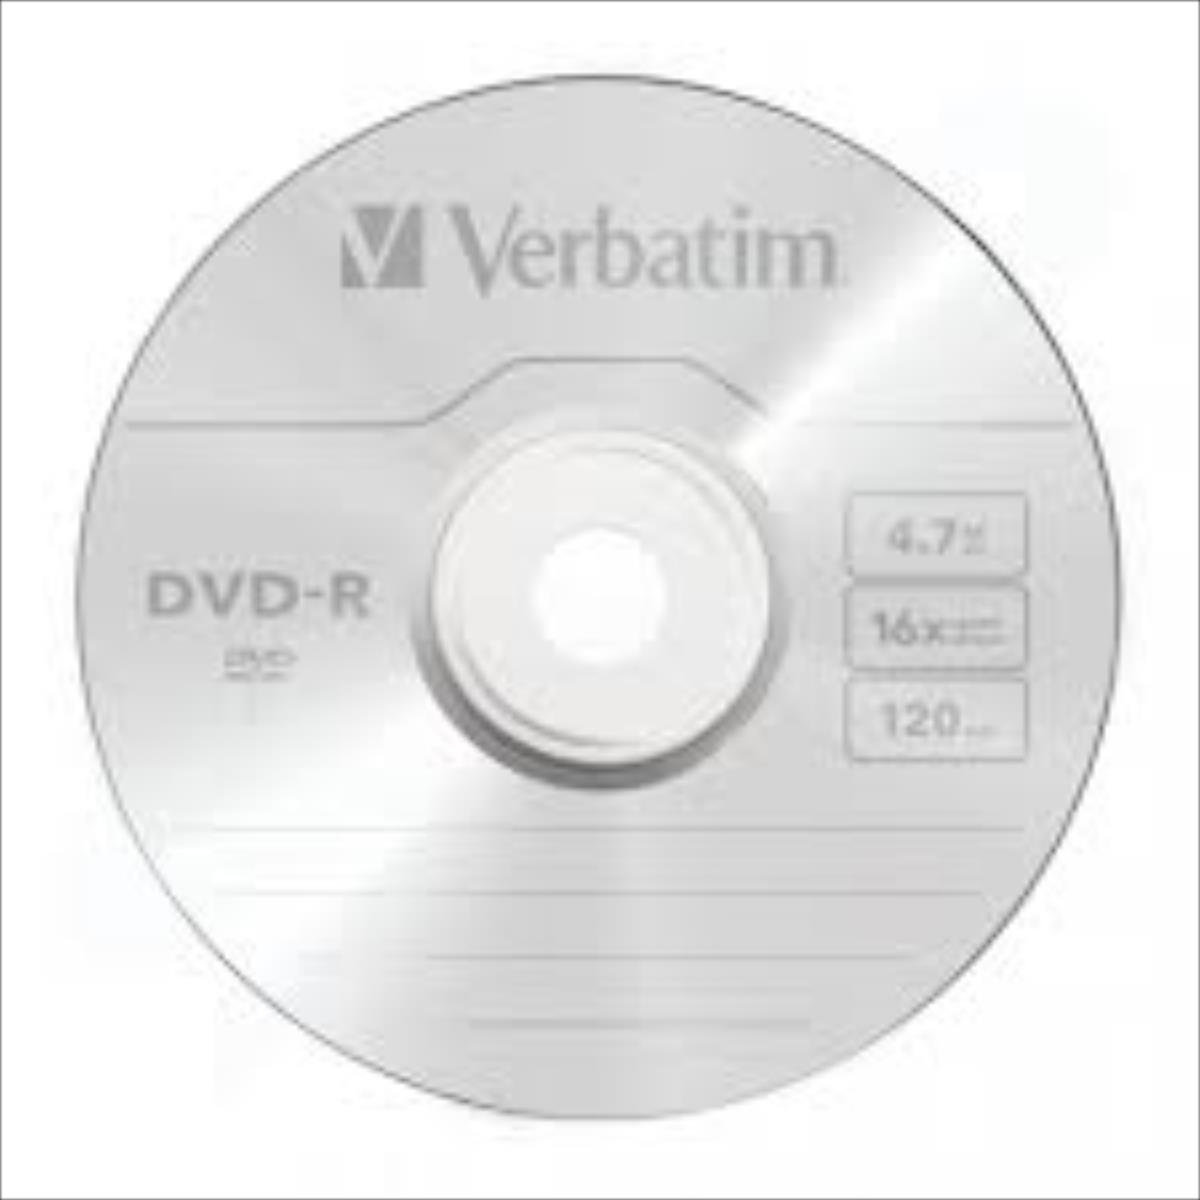 Verbatim DVD-R/1/ 4.7GB 16x (505) matricas